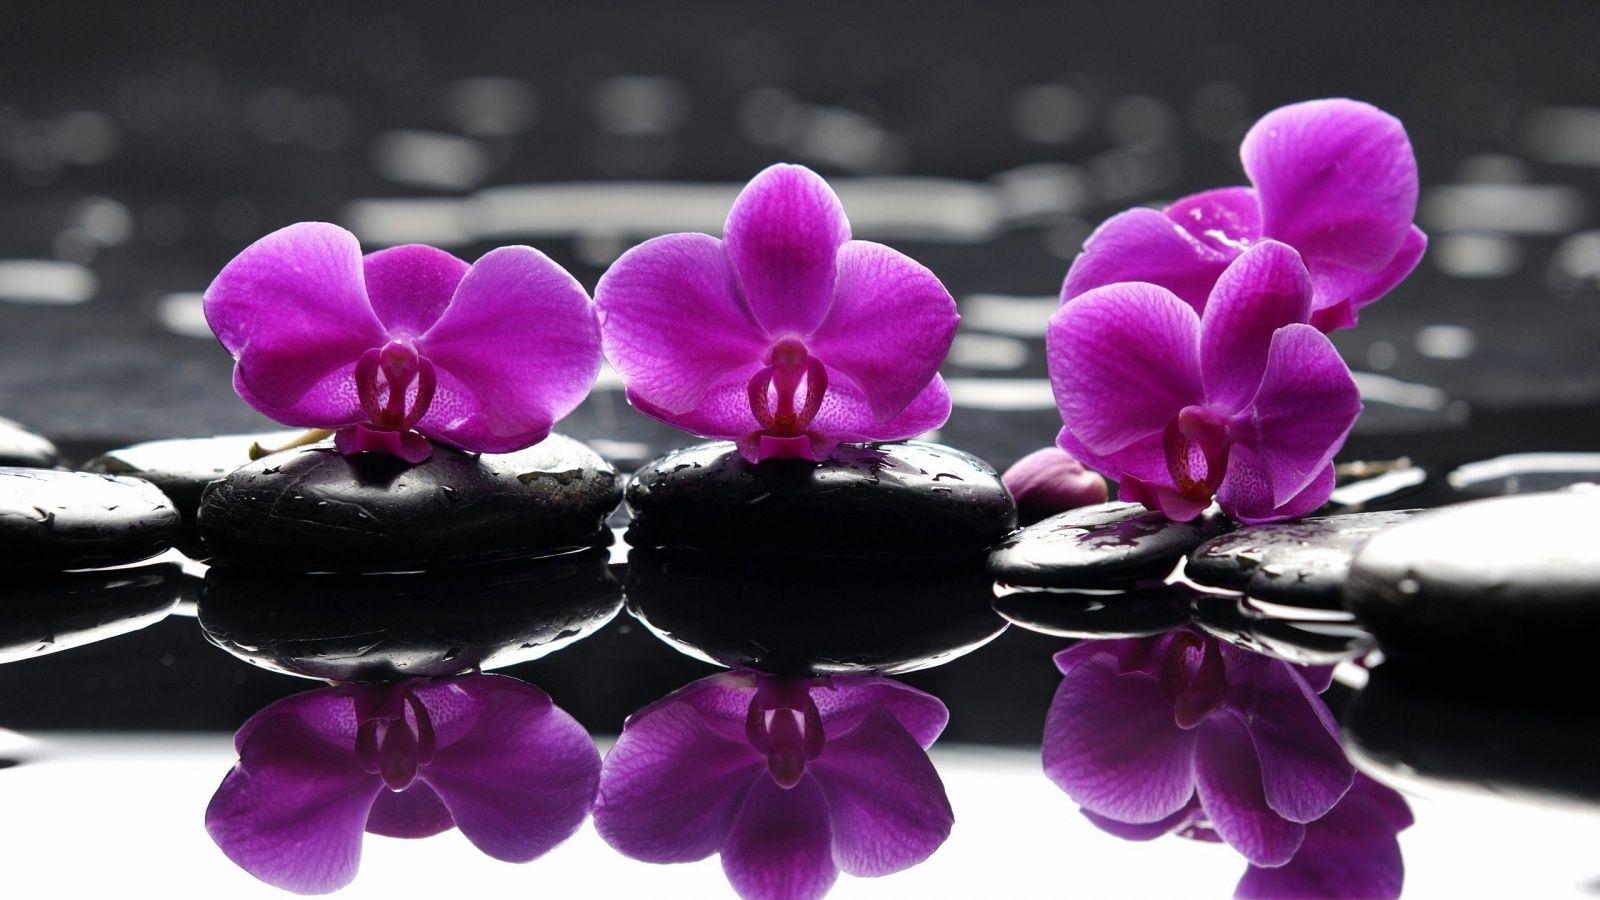 Orchid-Flower-5.jpg (1600×900)